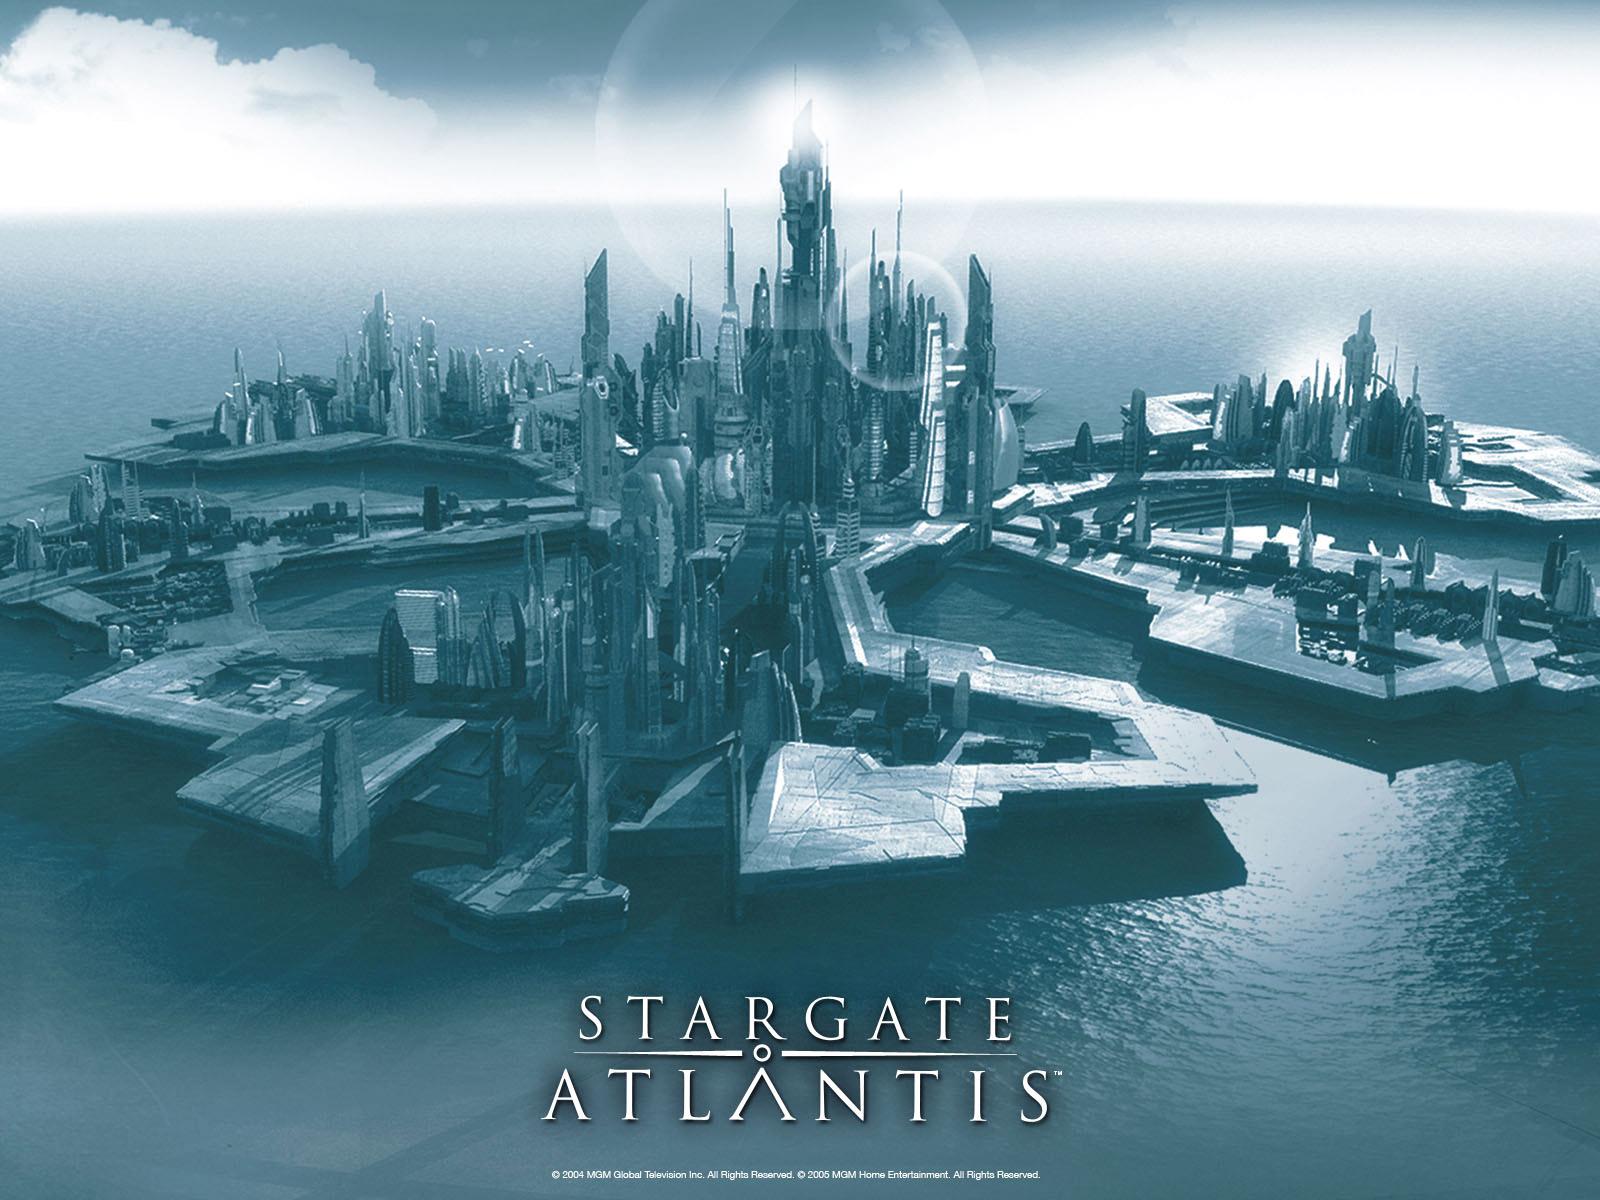 88 Stargate Atlantis HD Wallpapers | Backgrounds - Wallpaper Abyss